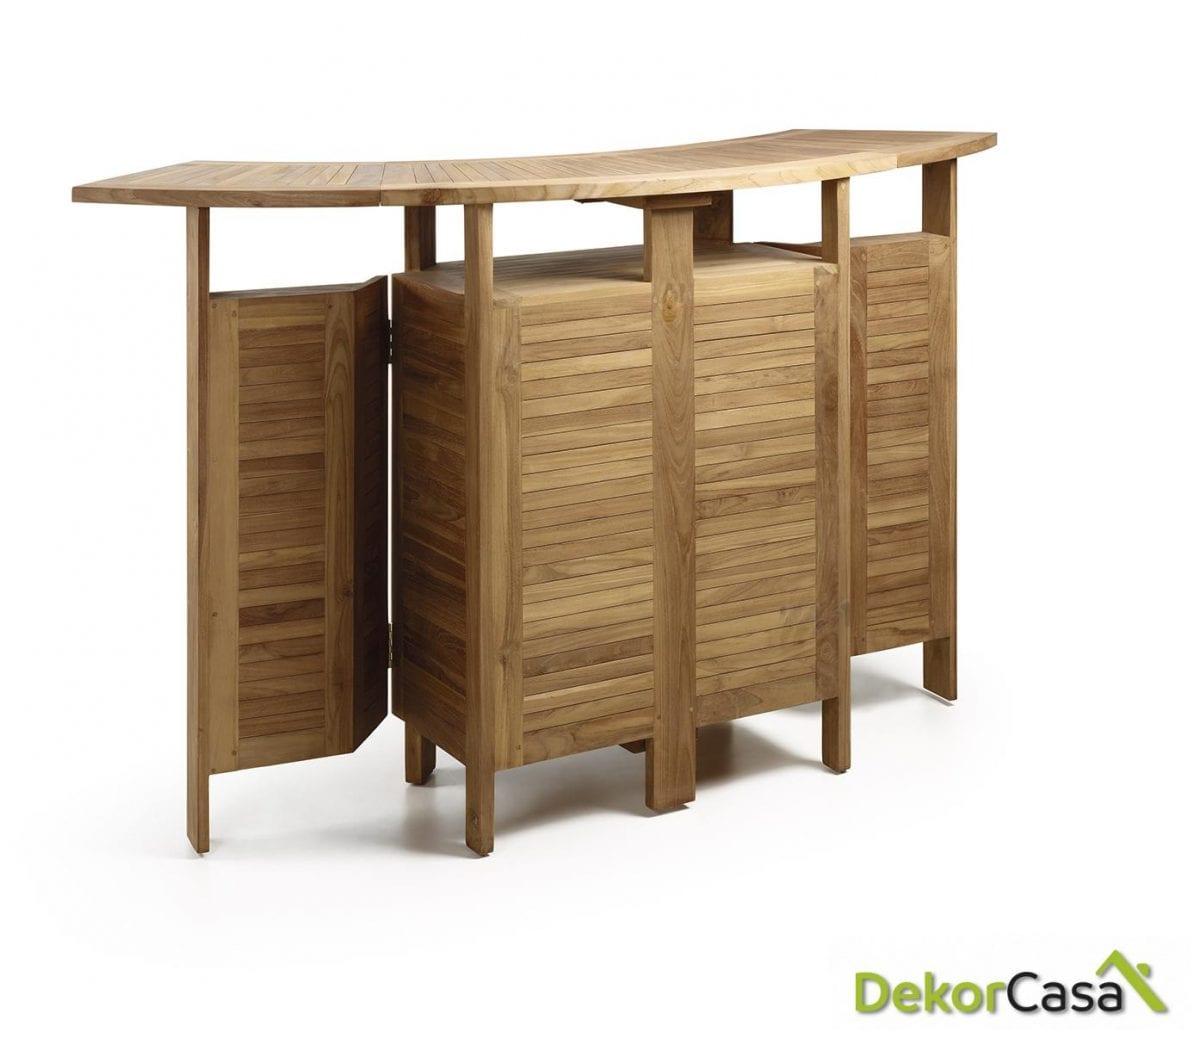 Mueble bar jardín plegable 98/180 x 70 x 106 cm